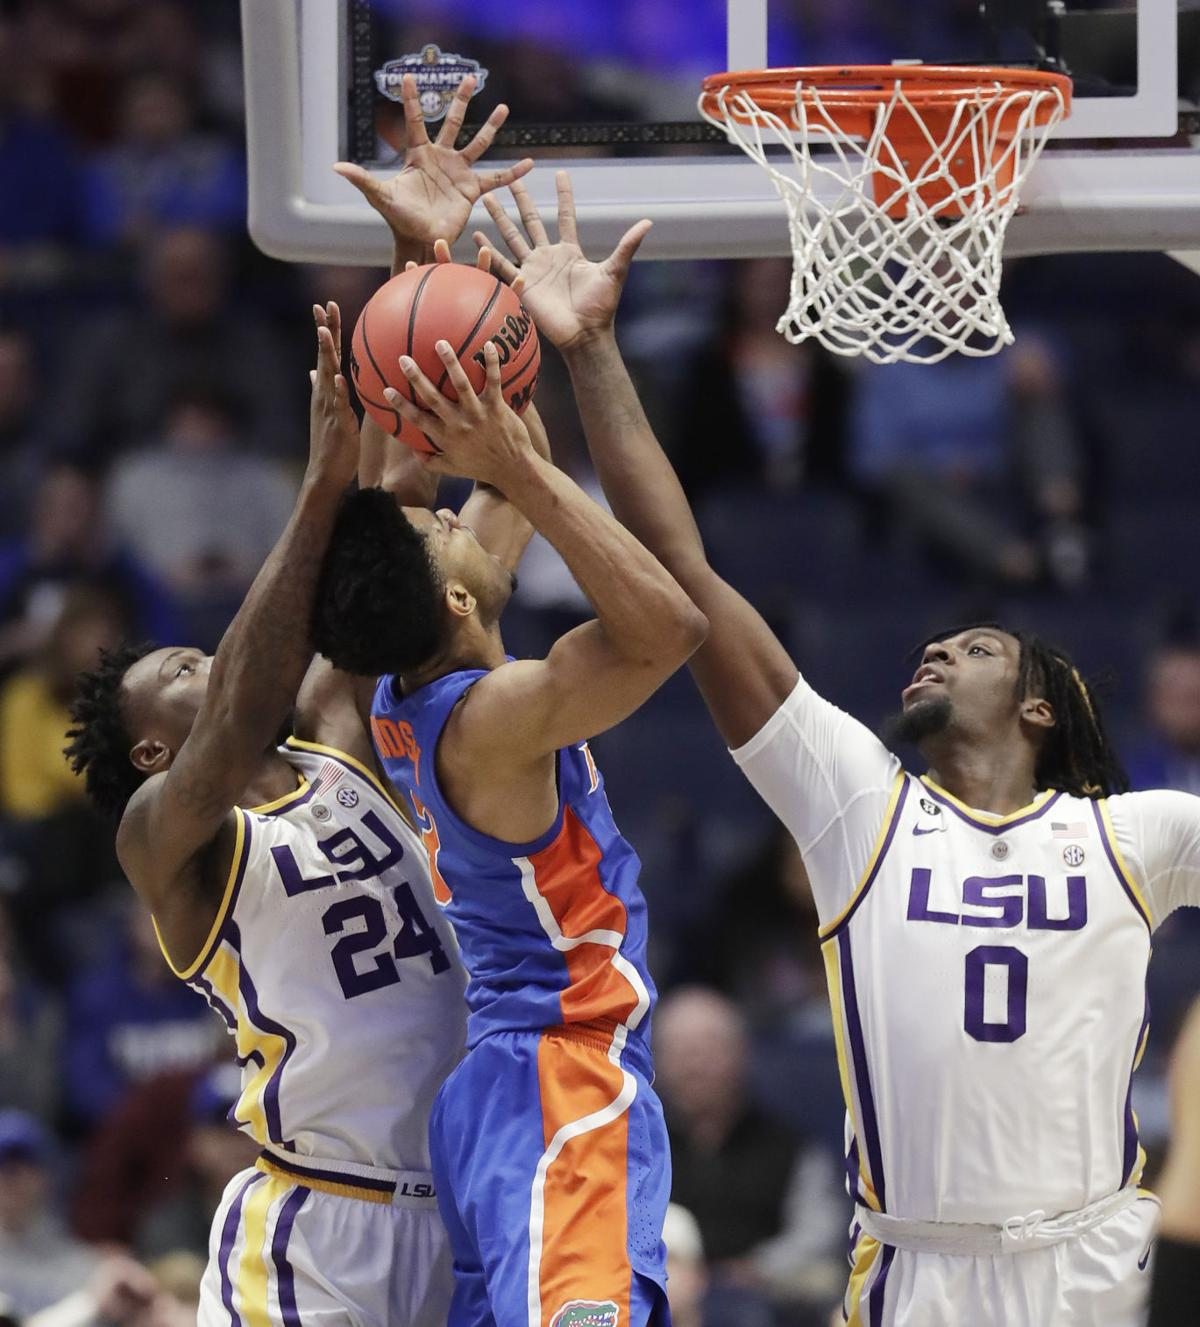 SEC Florida LSU Basketball